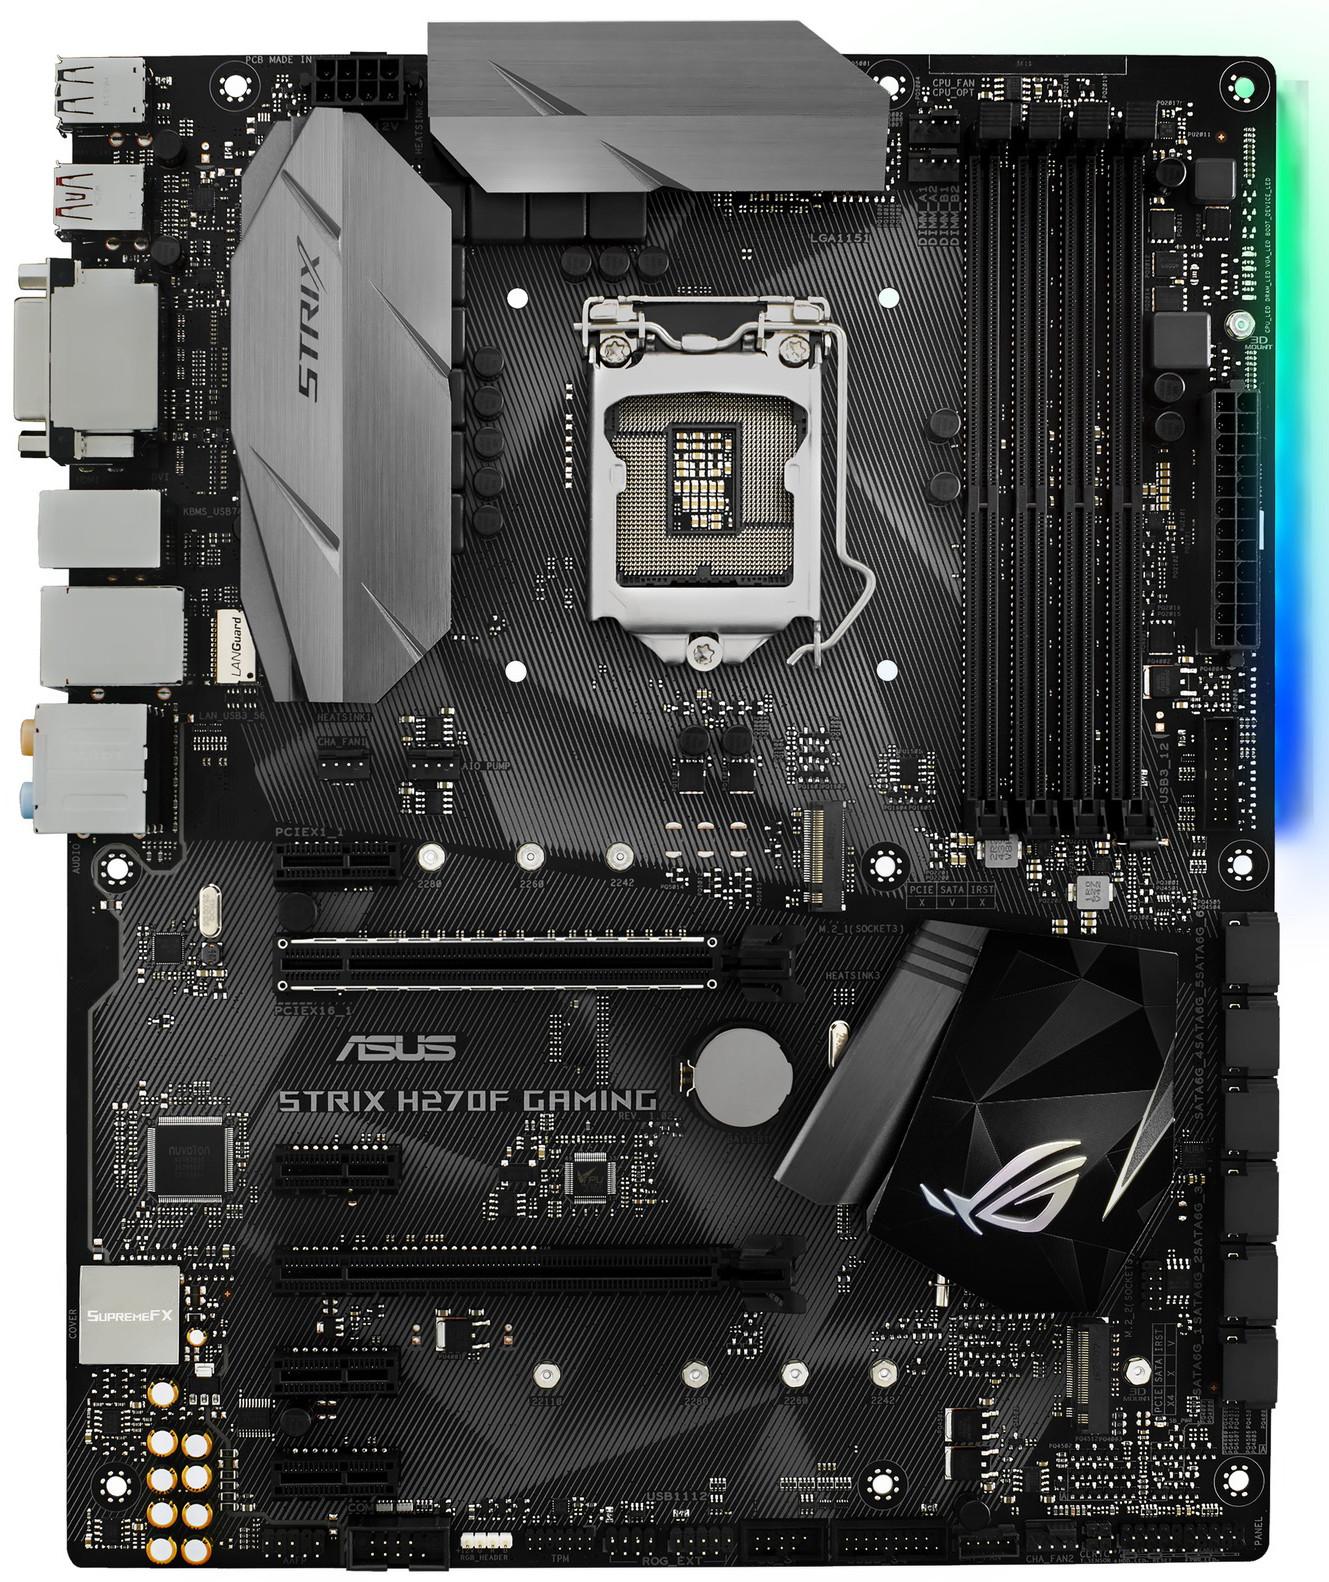 Материнская плата Asus ROG Strix H270F Gaming LGA 1151